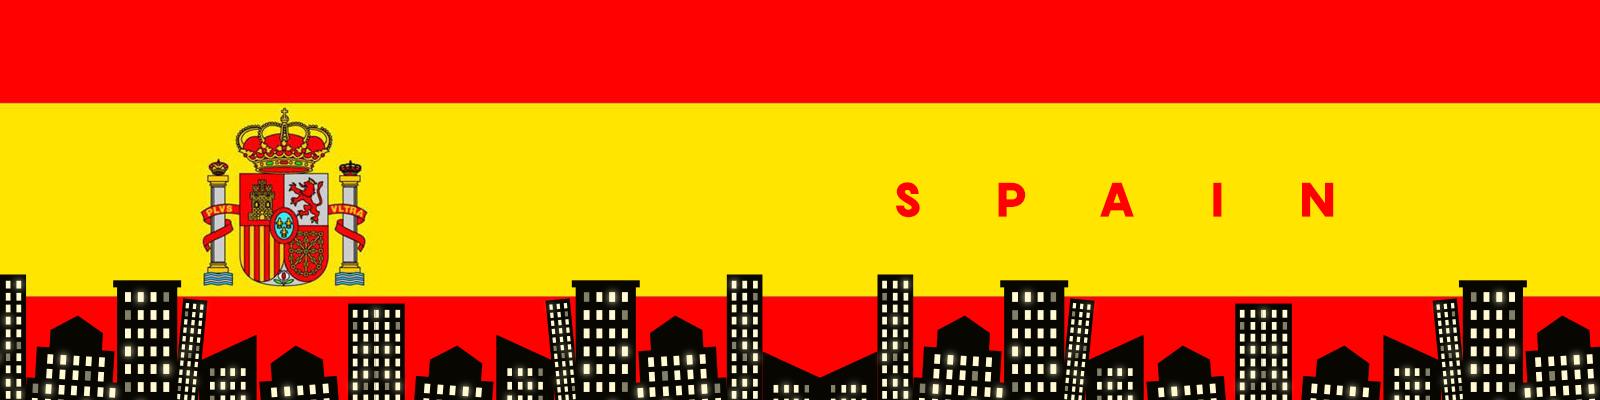 Spain app developers